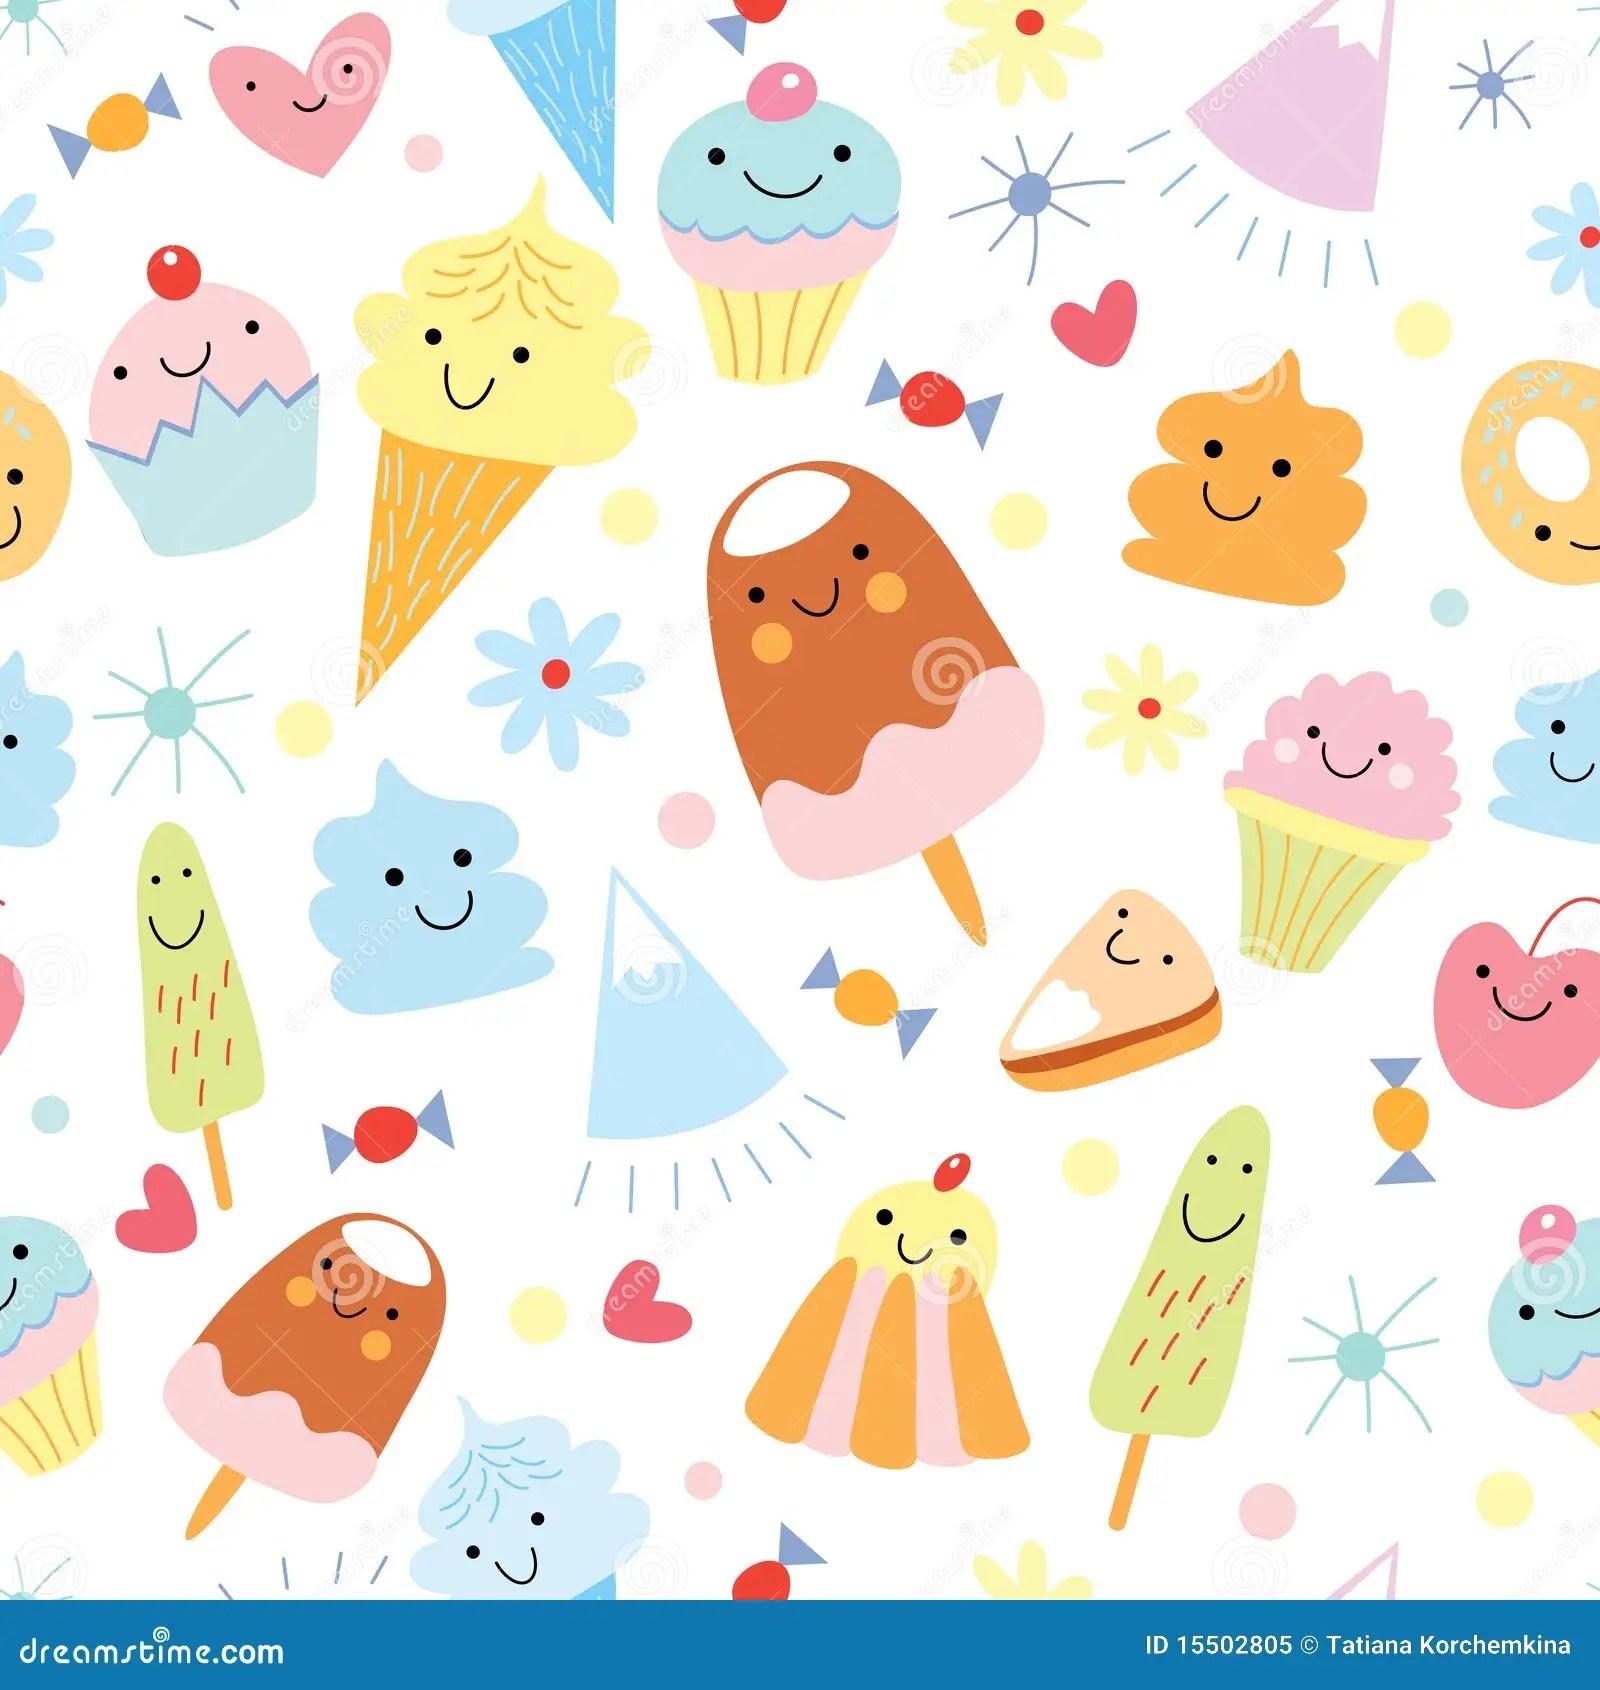 Blue Animal Print Wallpaper Texture Of Fun Ice Cream And Cake Stock Vector